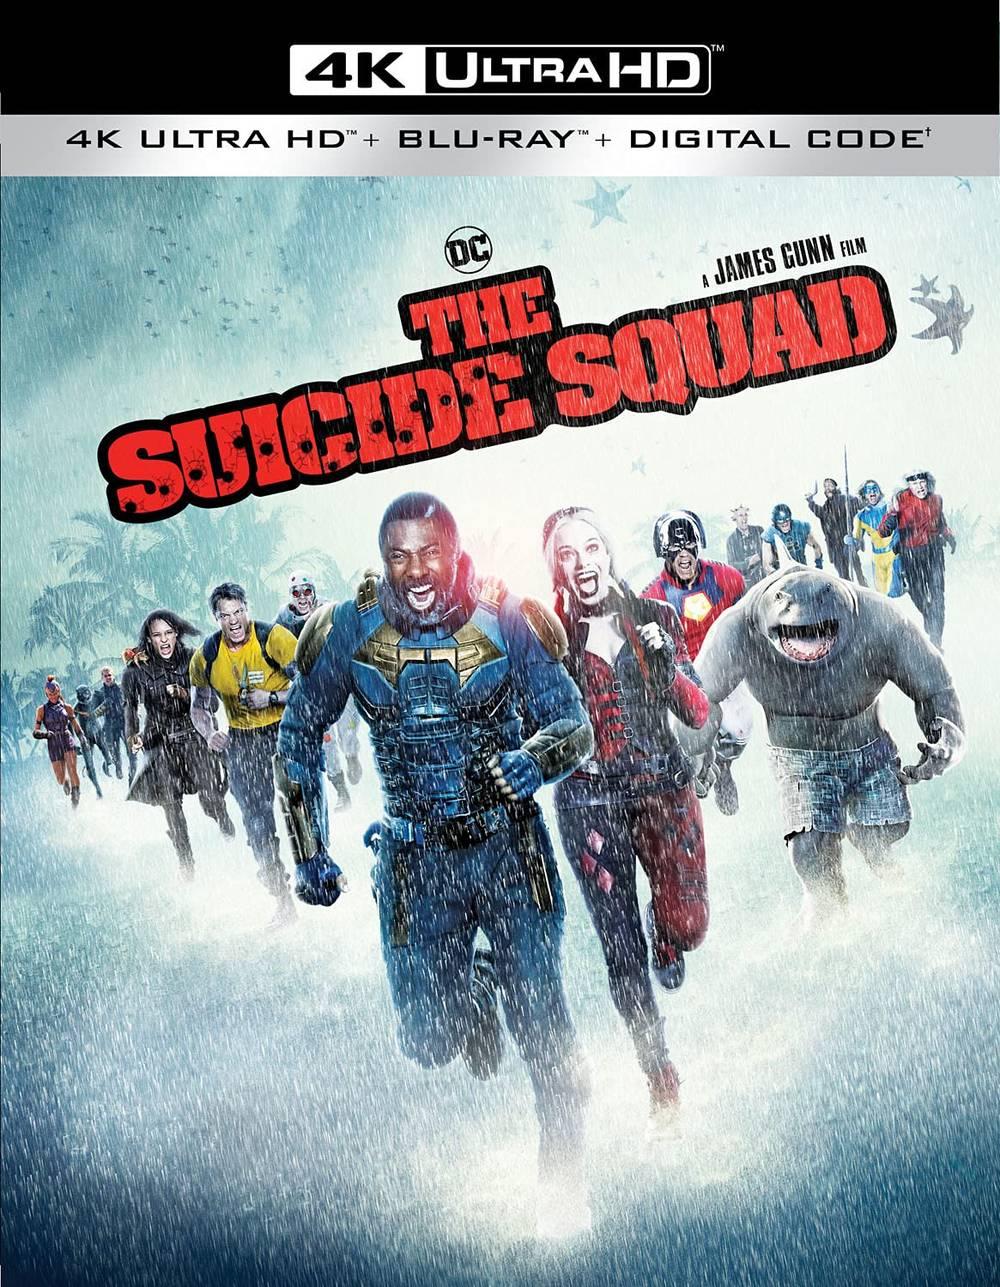 Suicide Squad [Movie] - The Suicide Squad [4K]